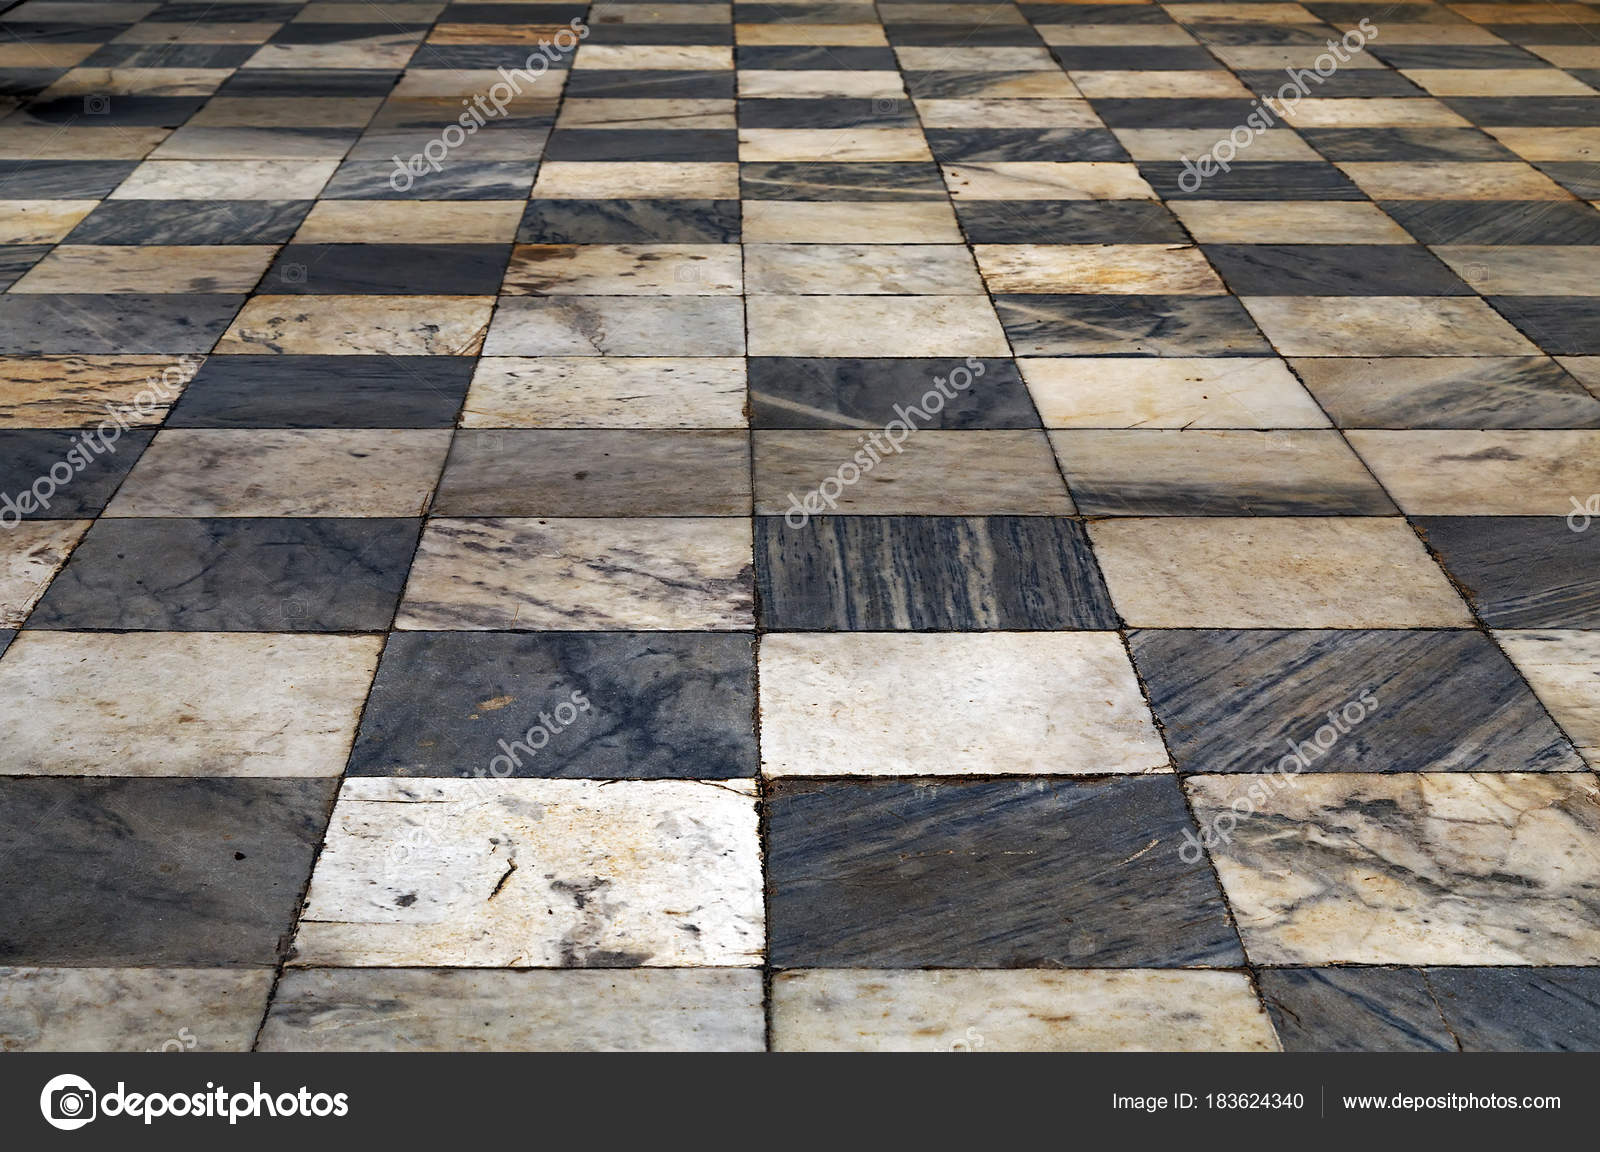 Zwart Wit Tegels : Zwart wit geruit perspectief weergave vloer grunge tegels ma